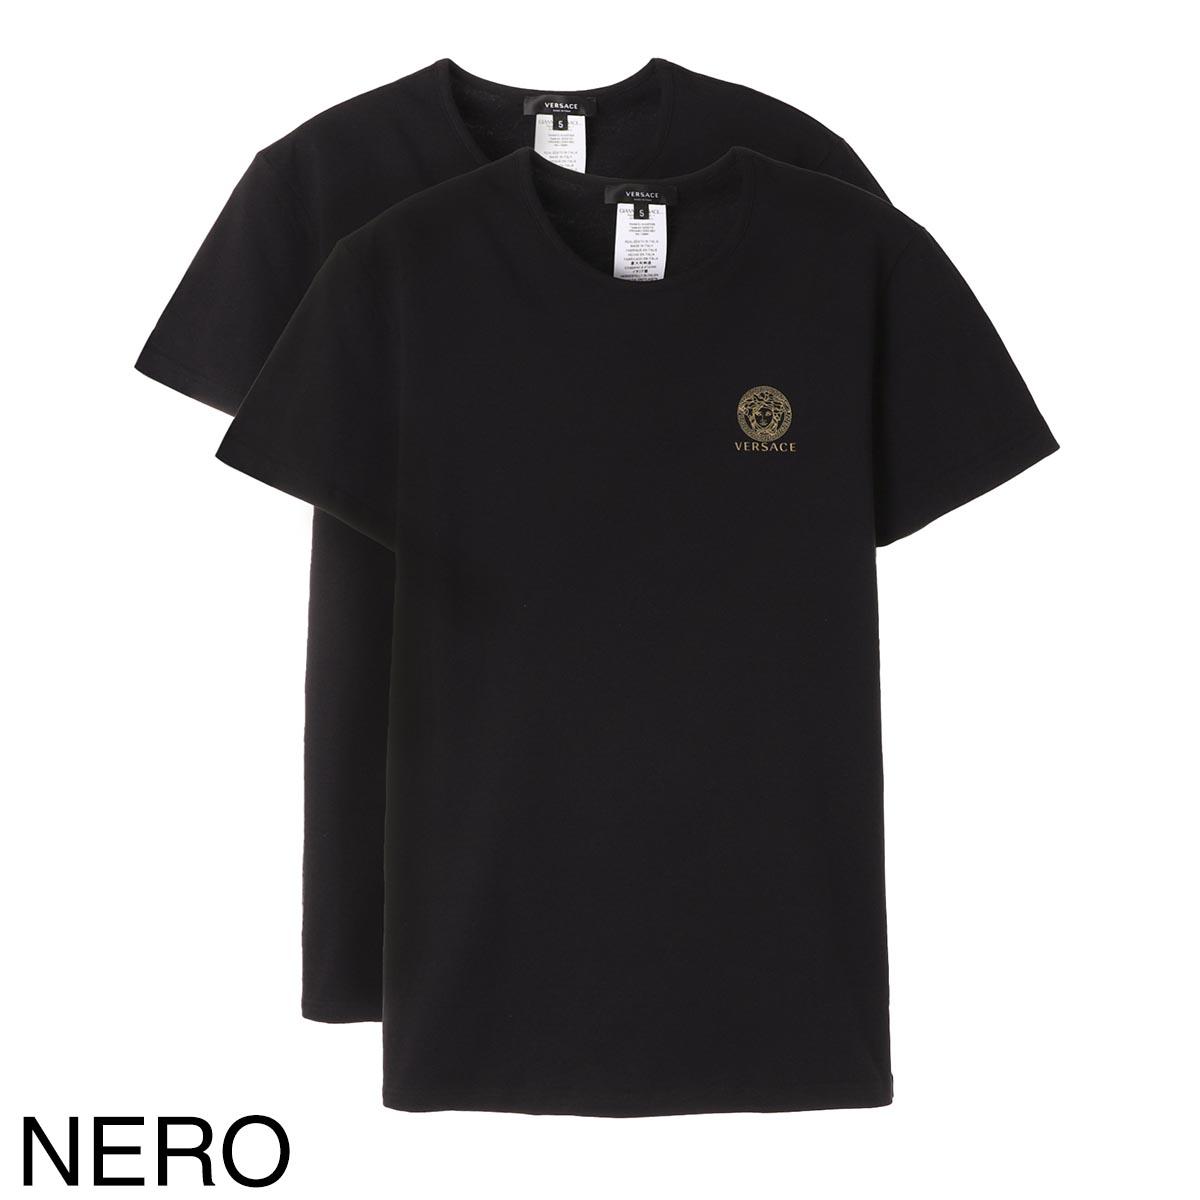 VERSACE ヴェルサーチェ クルーネック Tシャツ 2枚セット【返品交換不可】